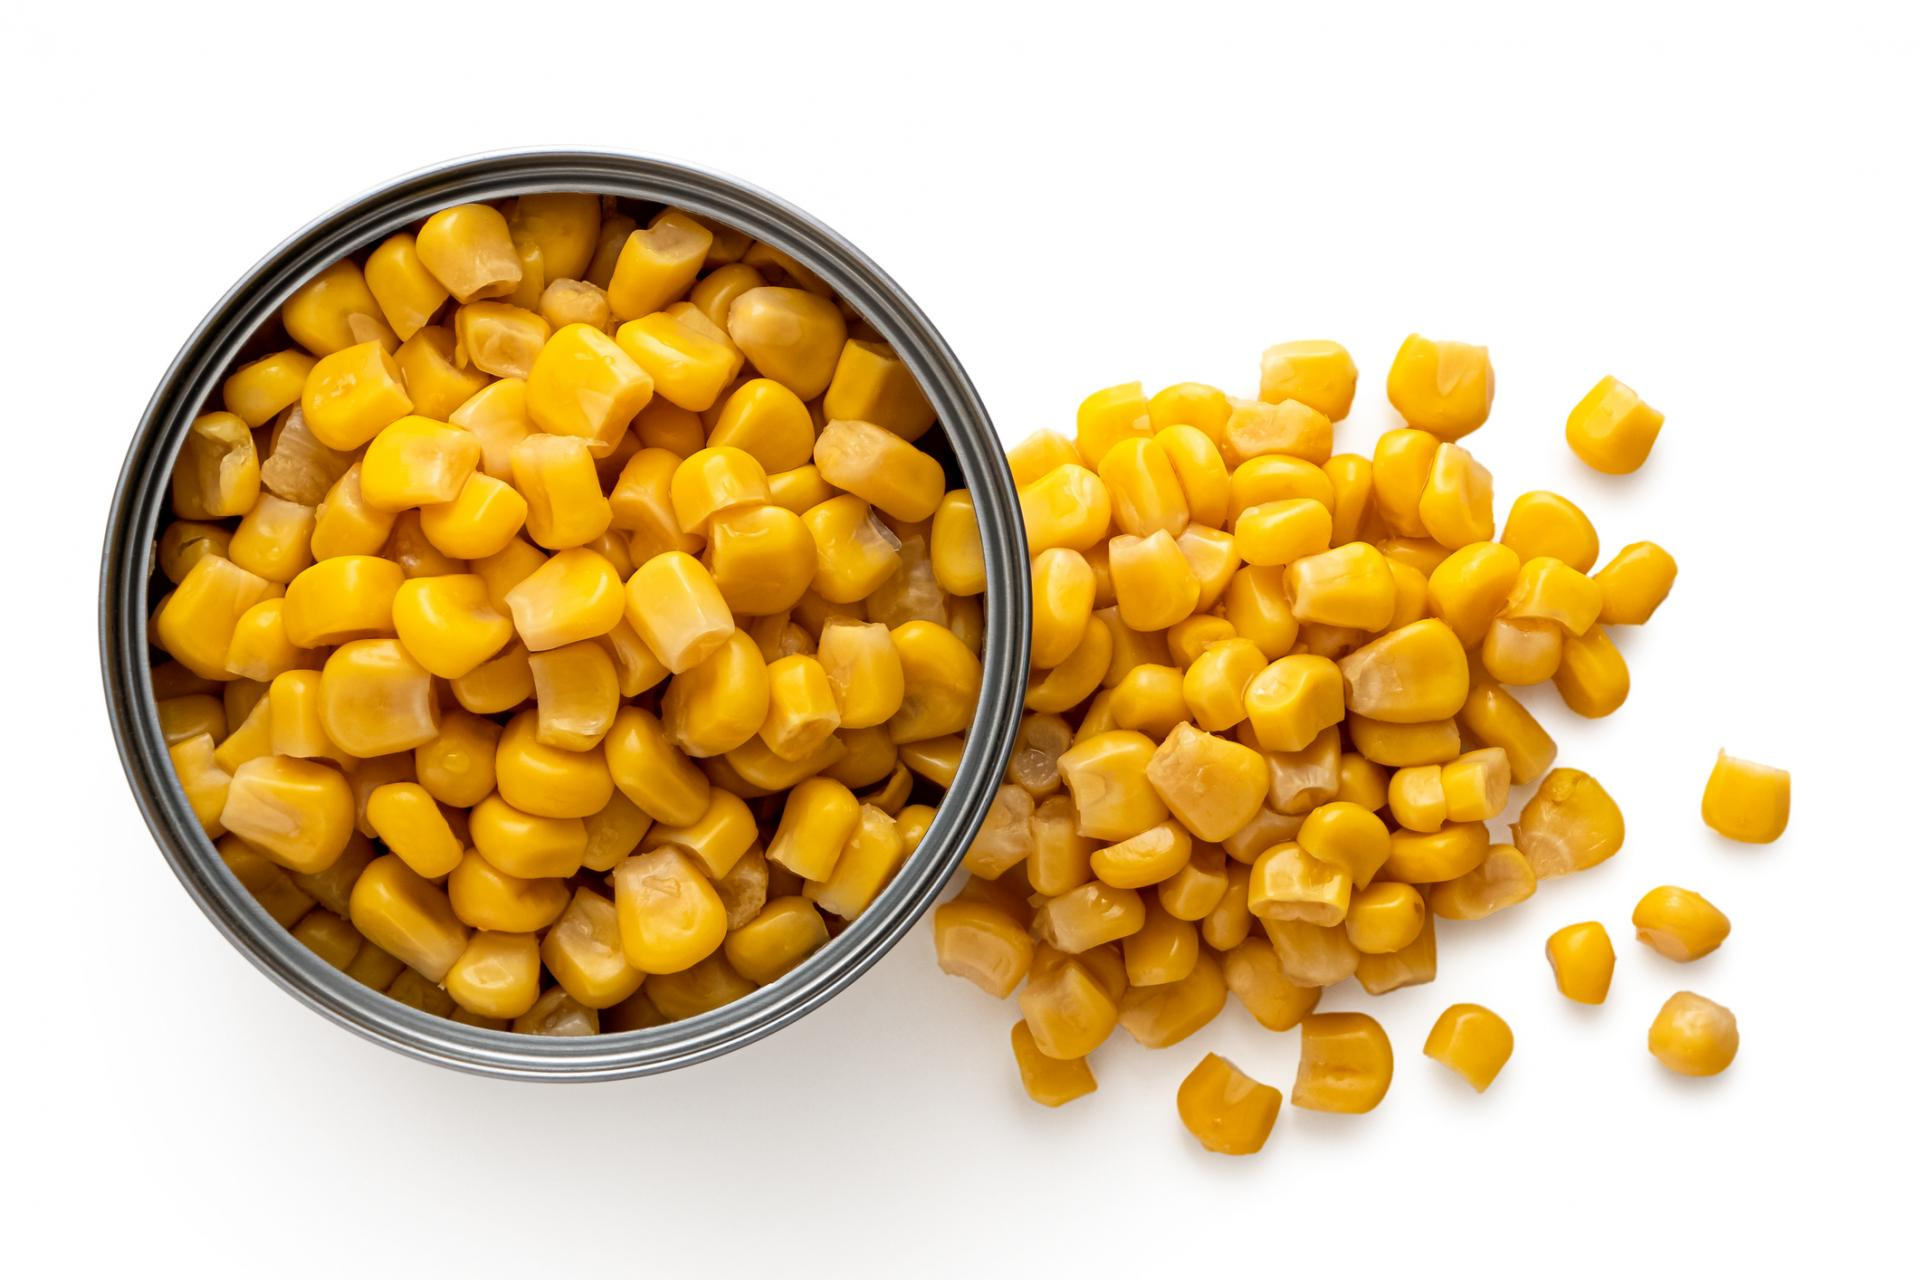 Iz domače kuhinje: Koruza je dobra v mnogih jedeh